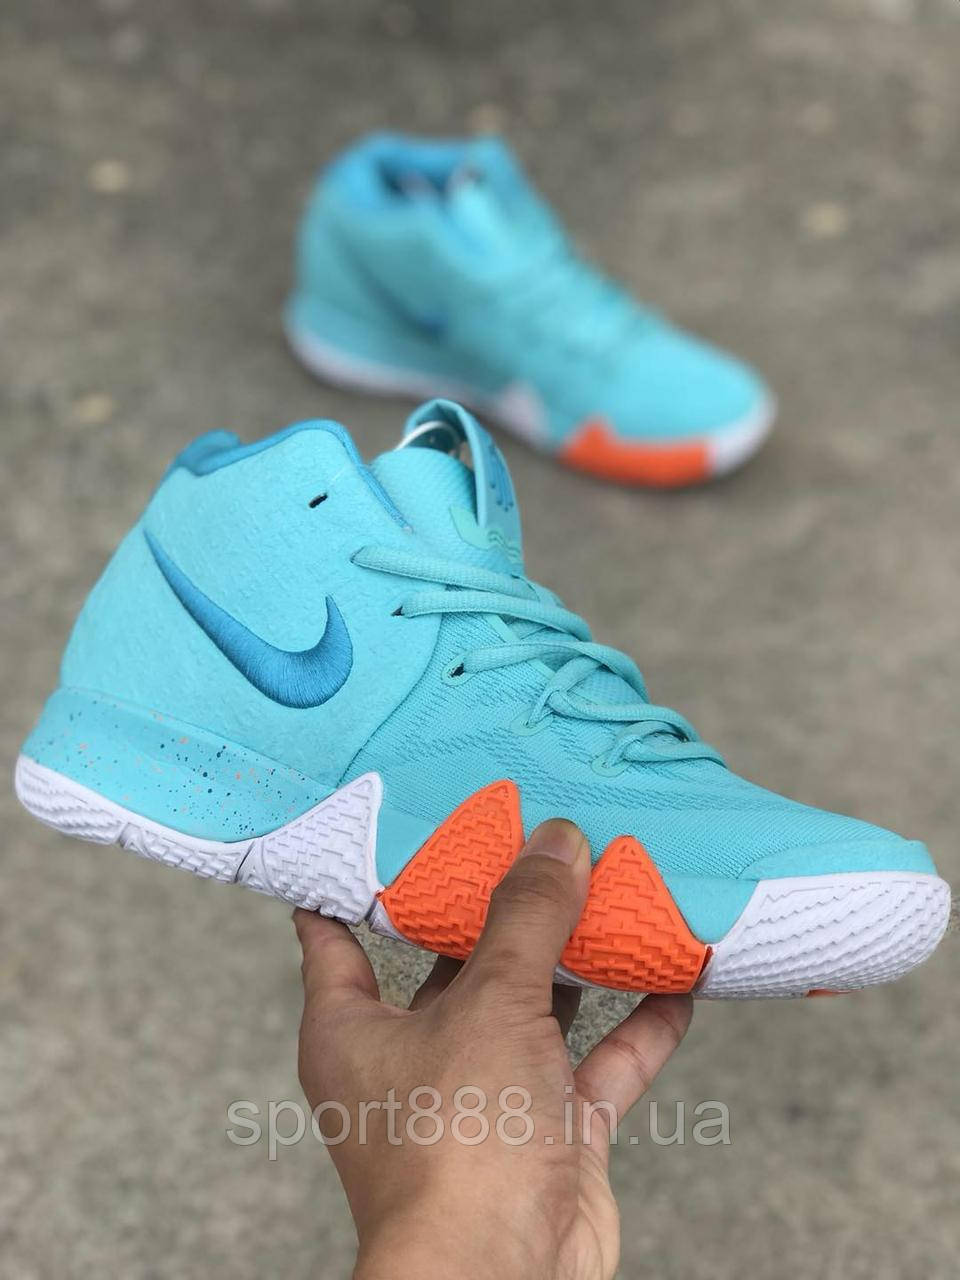 premium selection 6cf32 00b2a Nike Kyrie 4 Tiffany Power is Female женские детские кроссовки